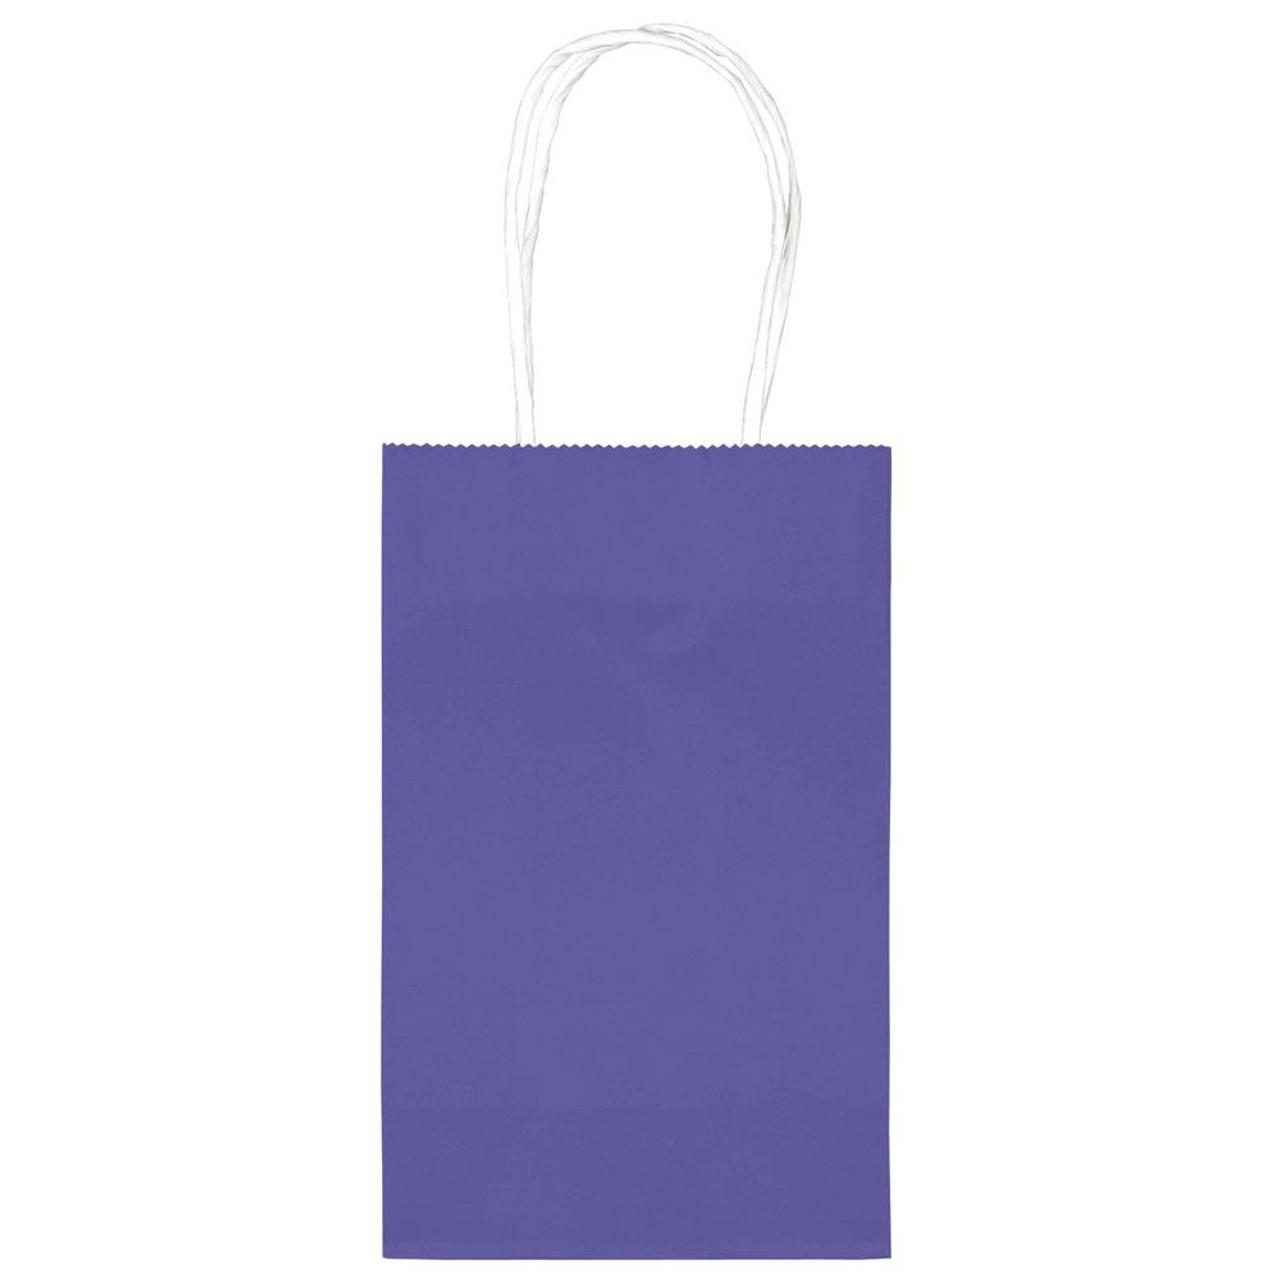 TREAT BAGS 10 BRIGHT ROYAL BLUE / YELLOW